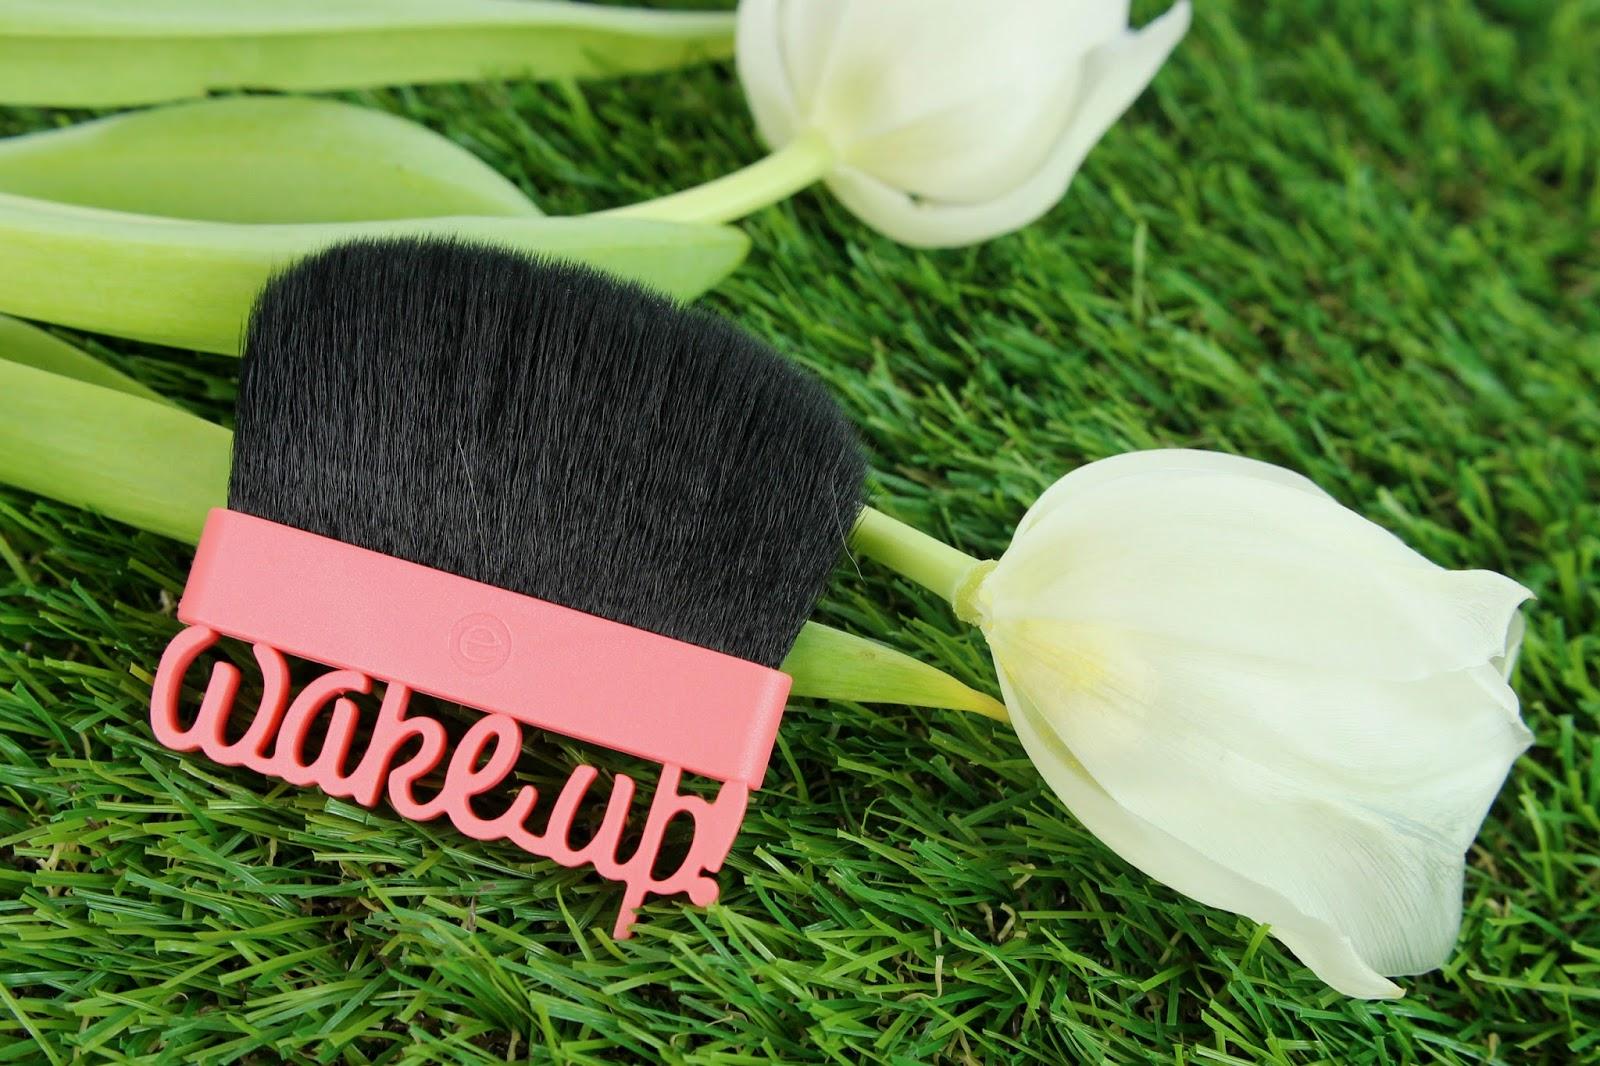 2016, blush, blush brush, call it spring, dm drogeriemarkt, essence, eyeliner pen, hello sunshine, le, limited edition, lipstick pen, märz, review, rouge, sheer lipbalm, swatches, top coat, tragebilder, wake up spring,